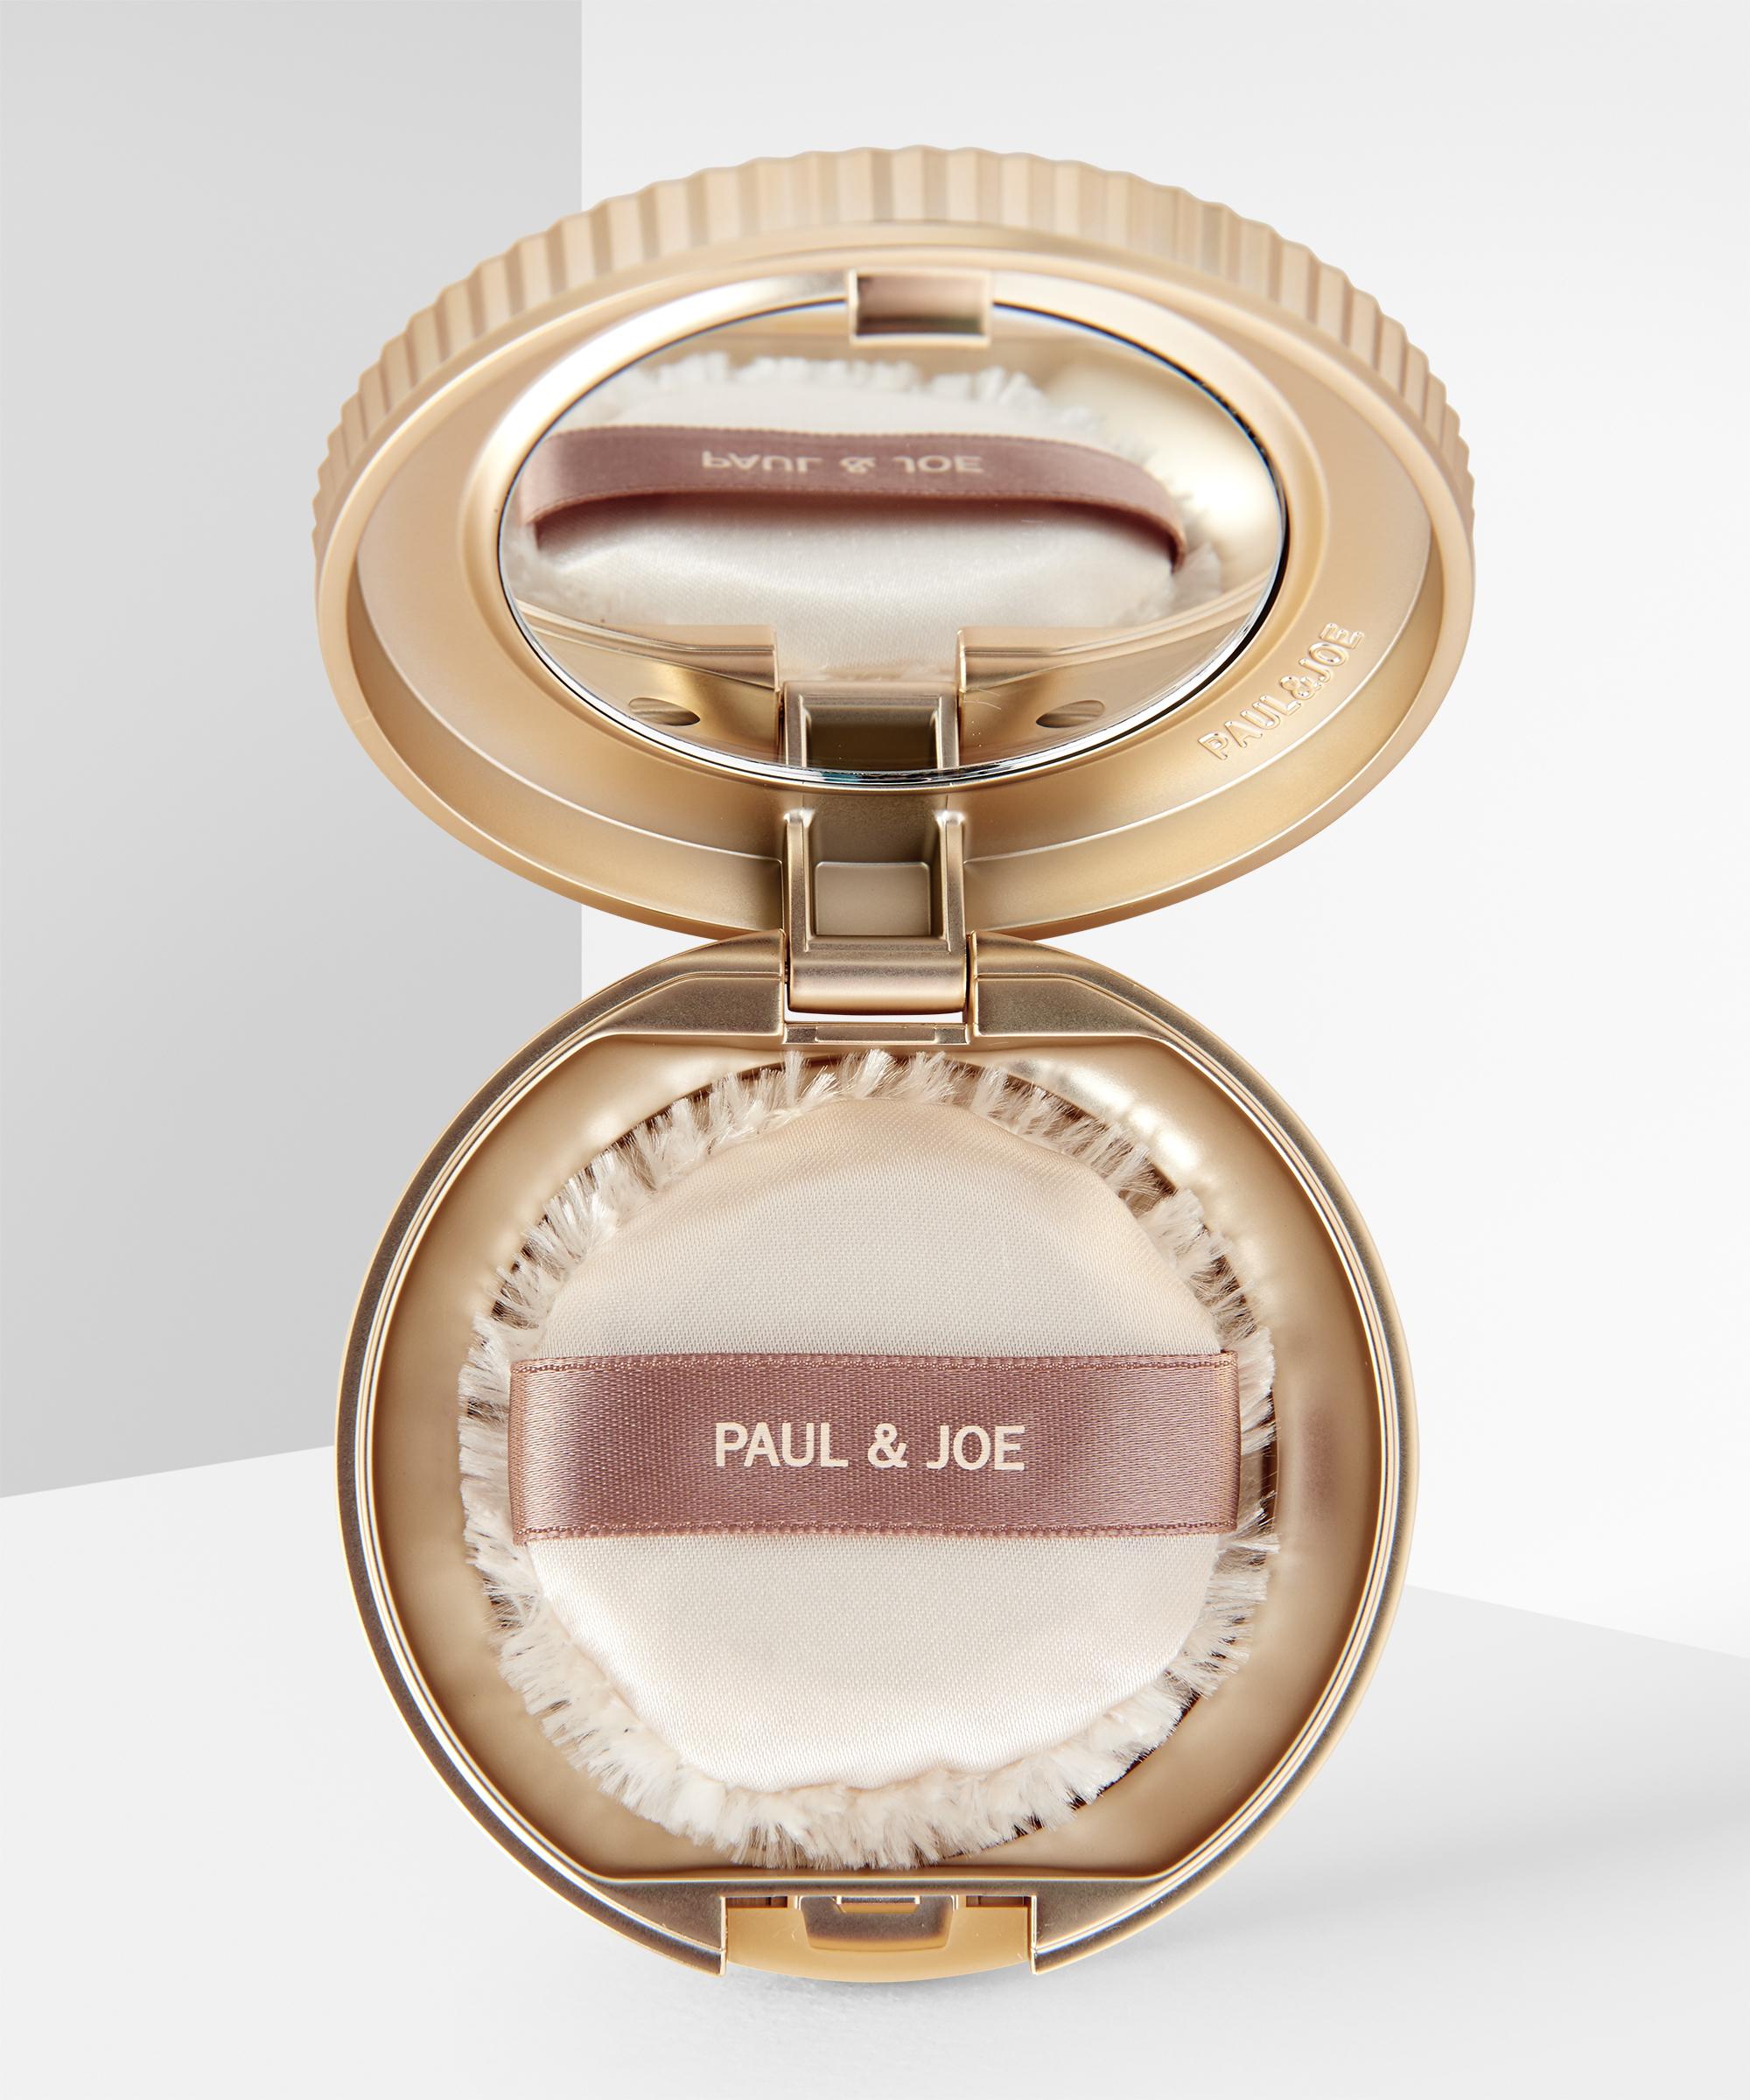 Paul & Joe Compact Case voor Pressed powder refill